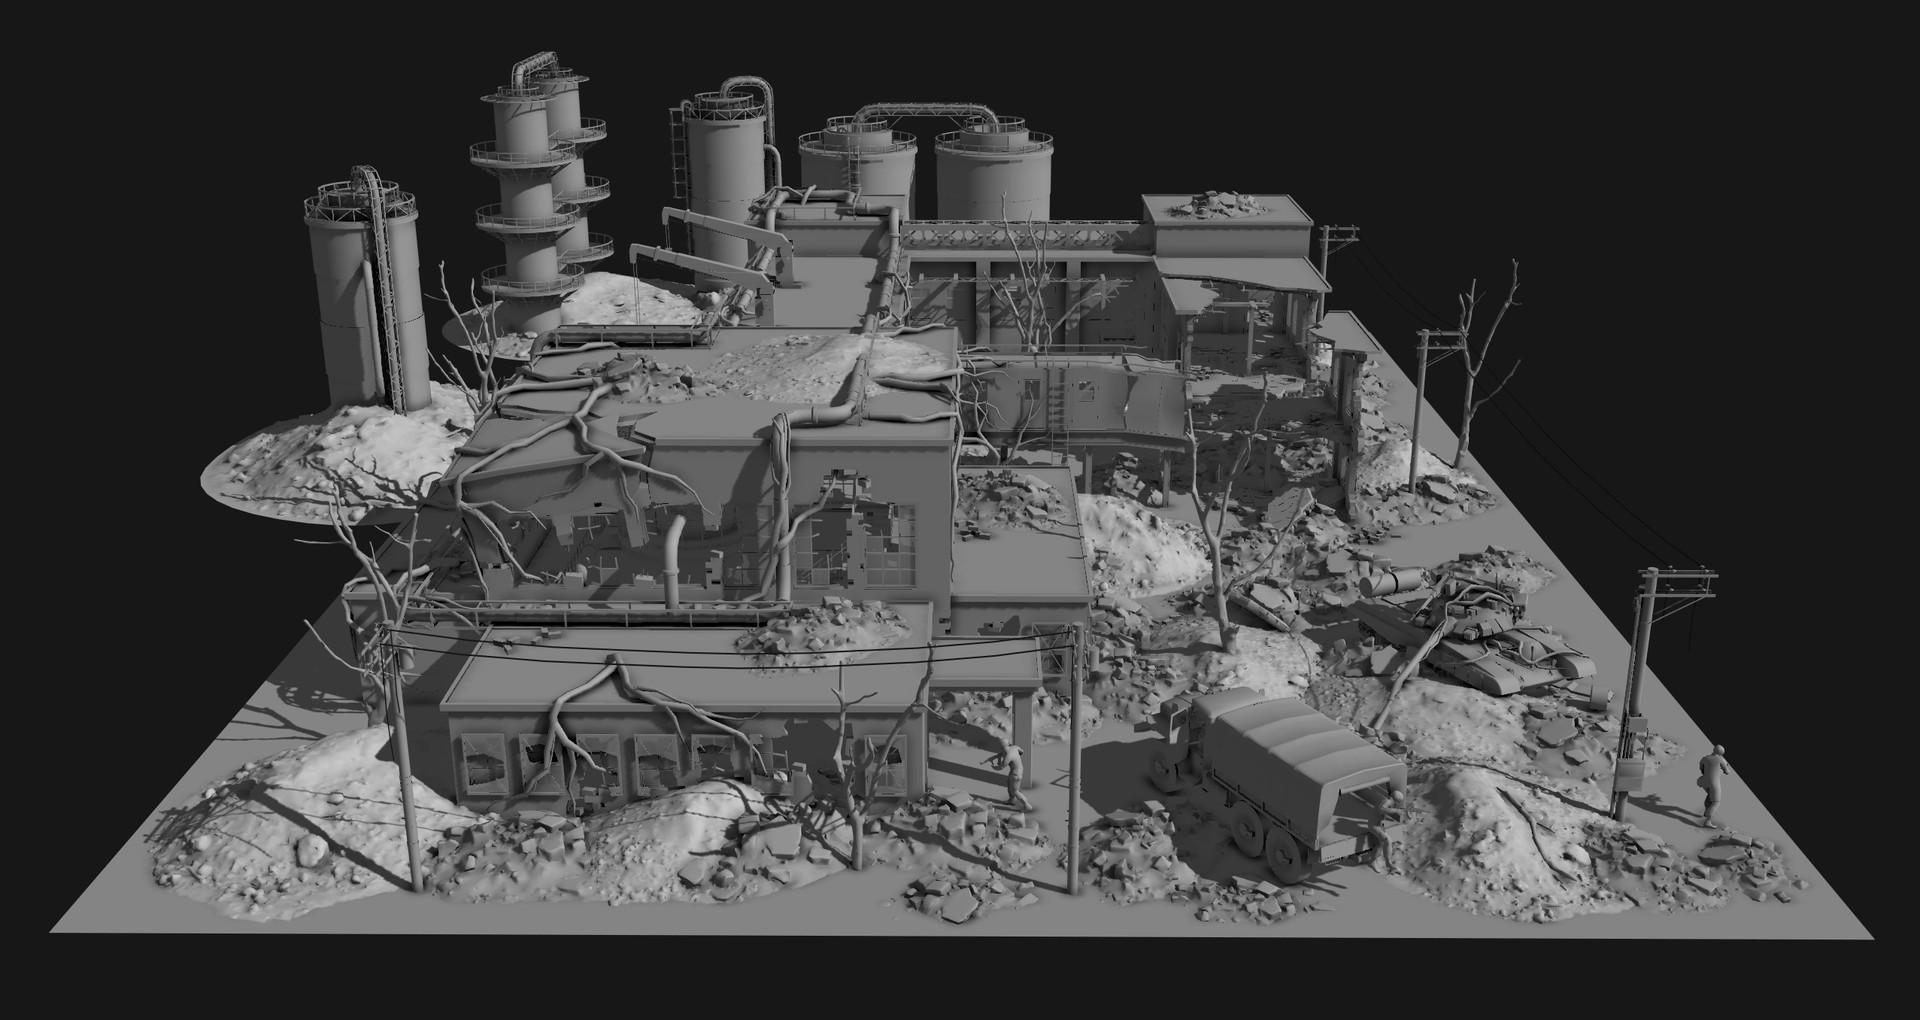 Robert max ramirez factoryscreenshots4